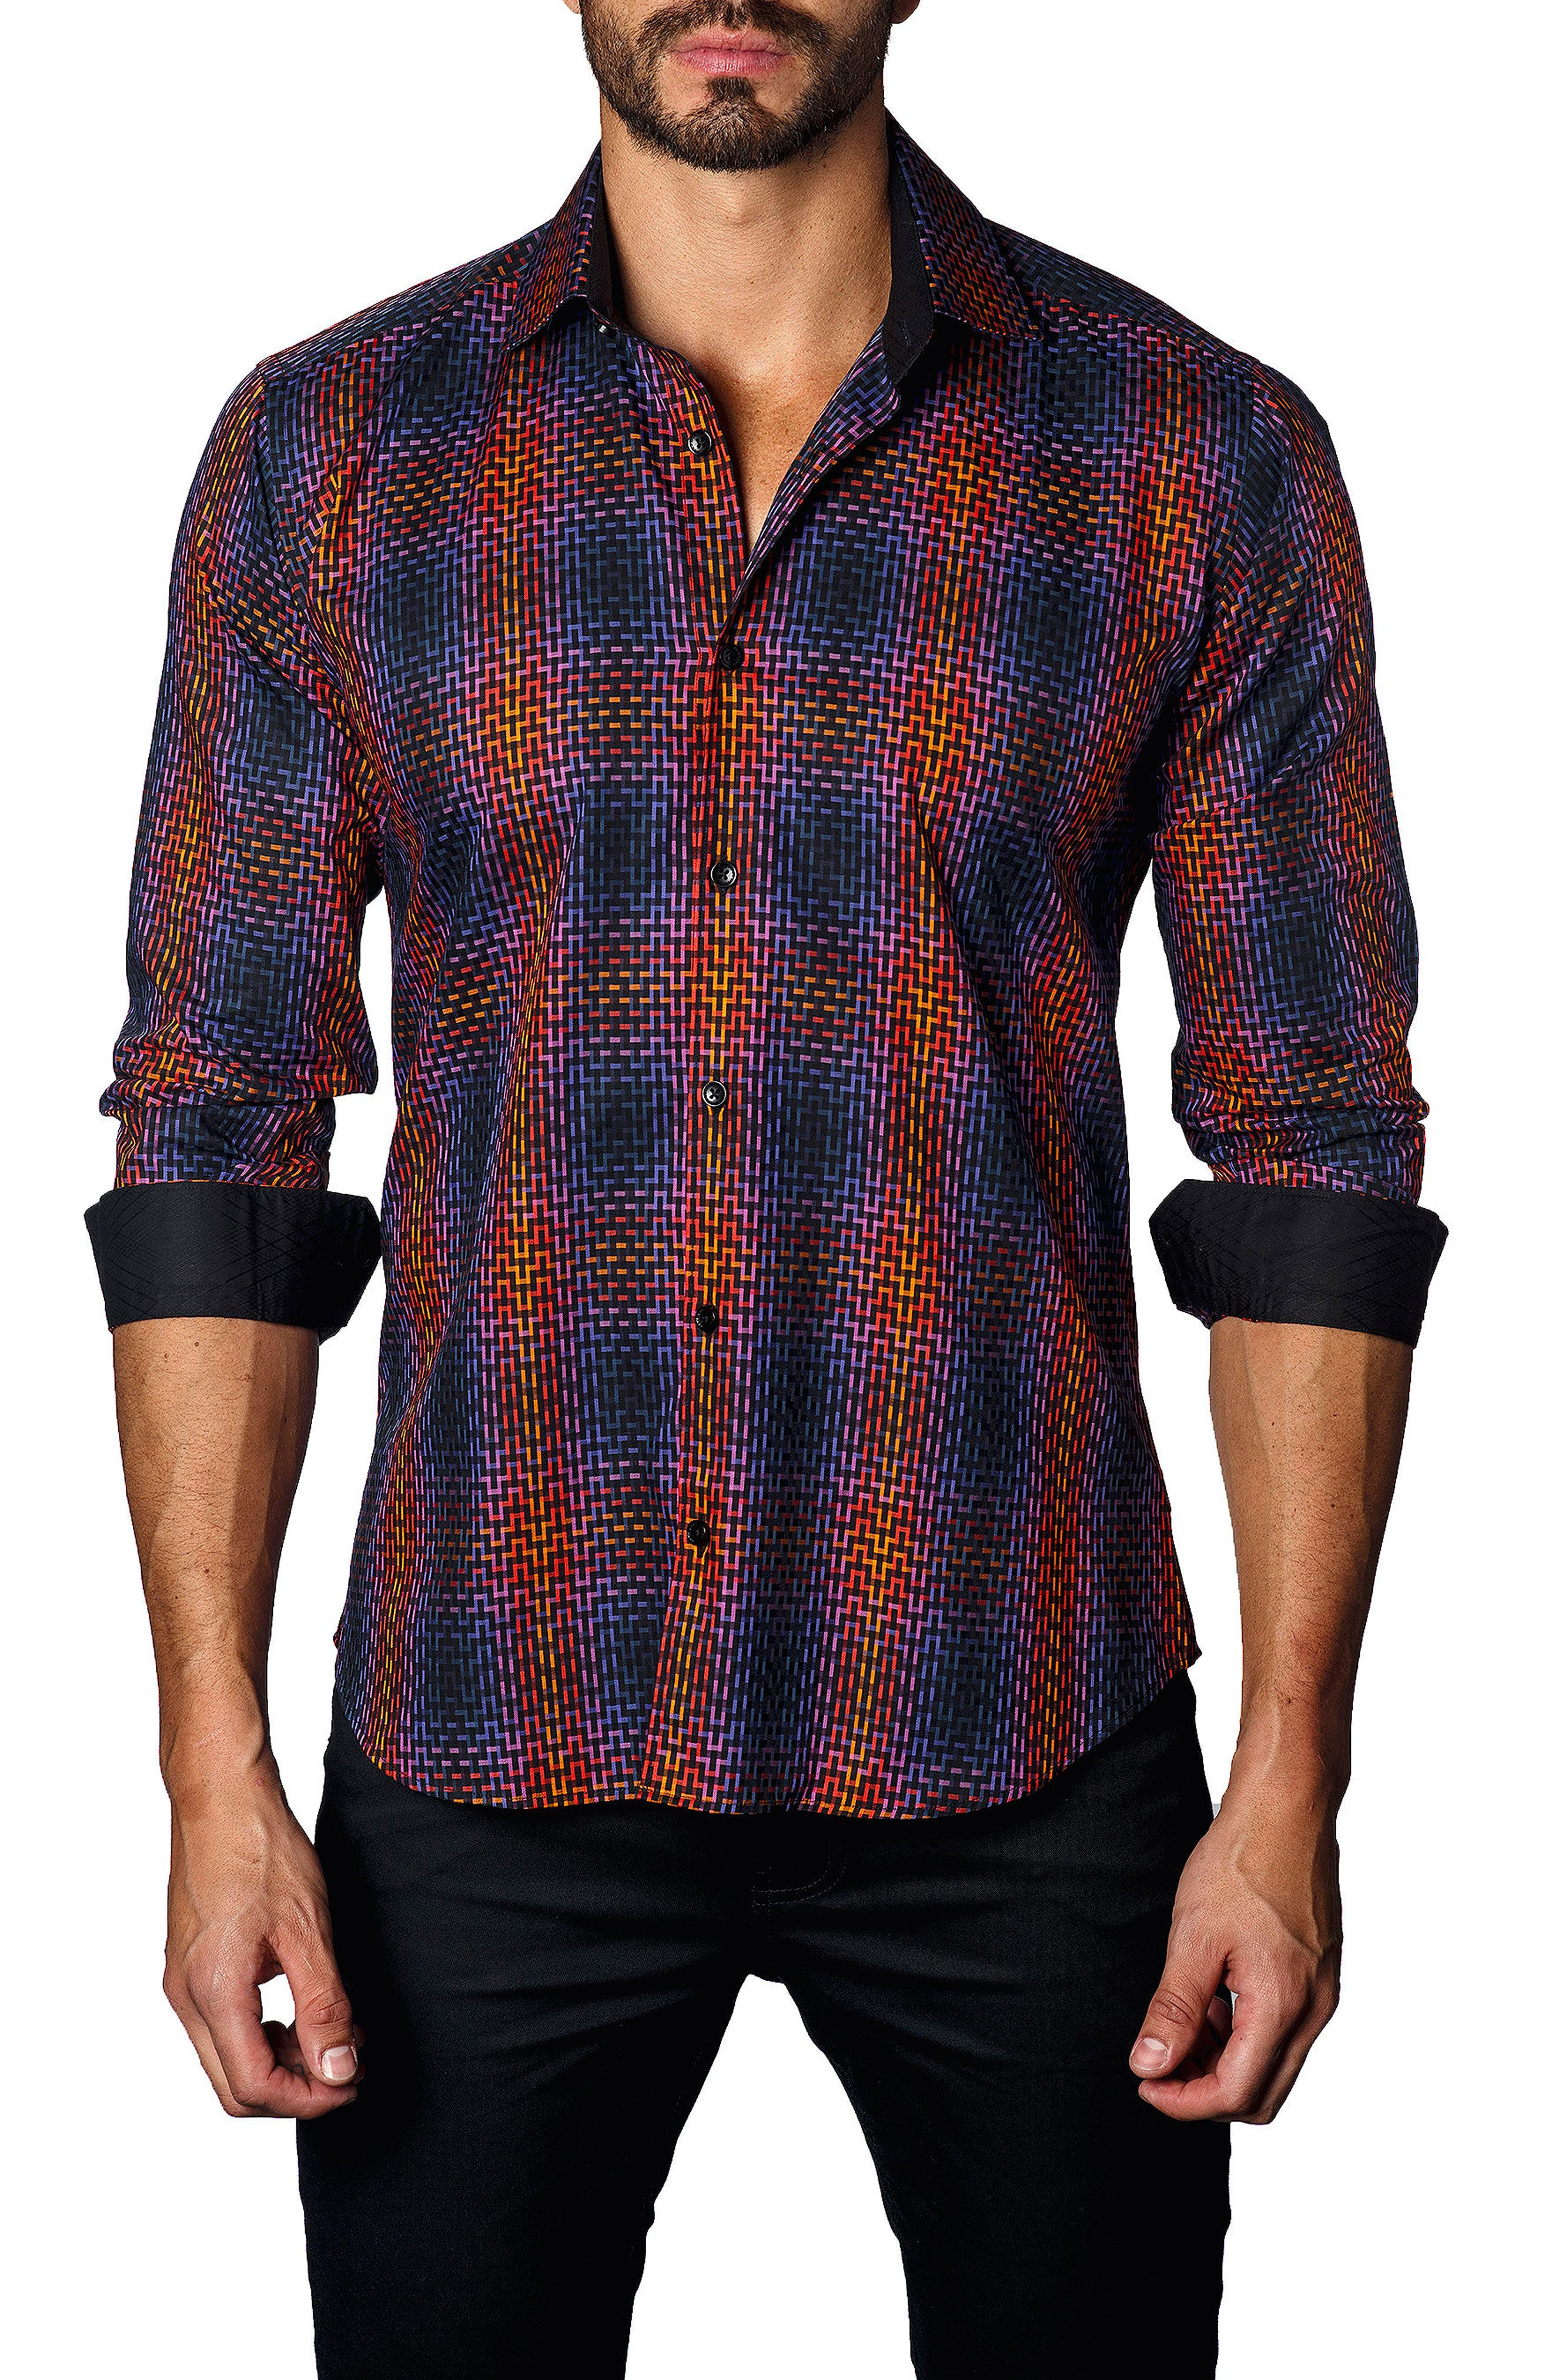 Alternate Image 1 Selected - Jared Lang Trim Fit Ombré Plaid Sport Shirt